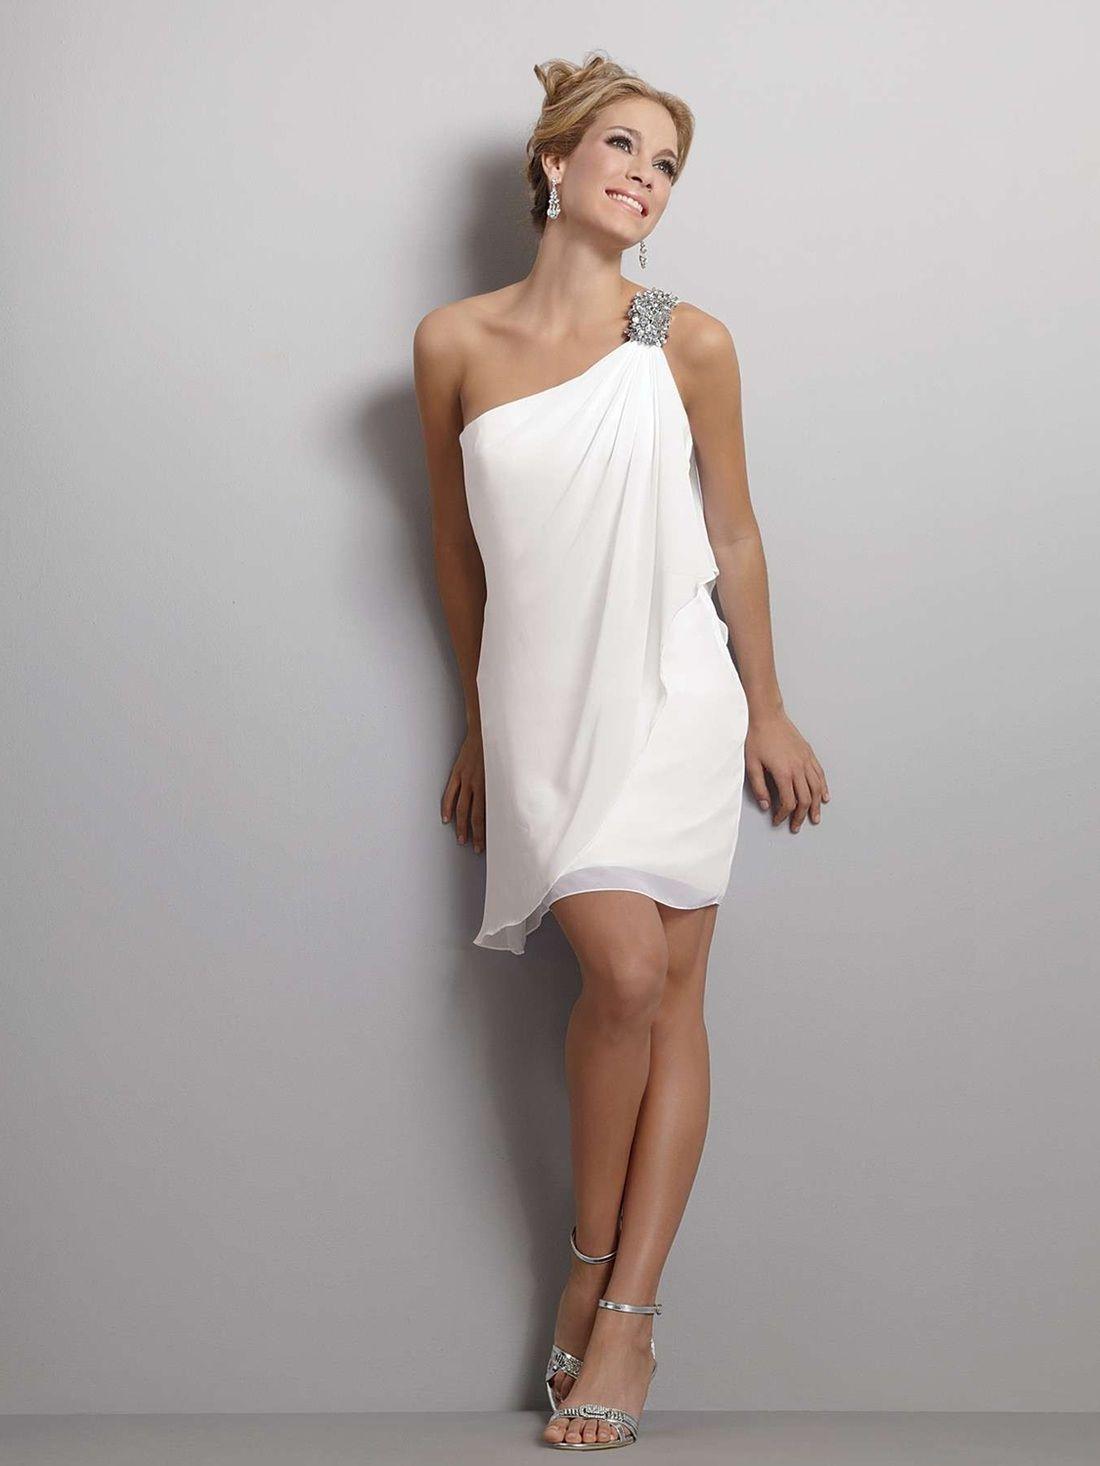 99+ Short Wedding Dresses Cheap - Plus Size Dresses for Wedding ...